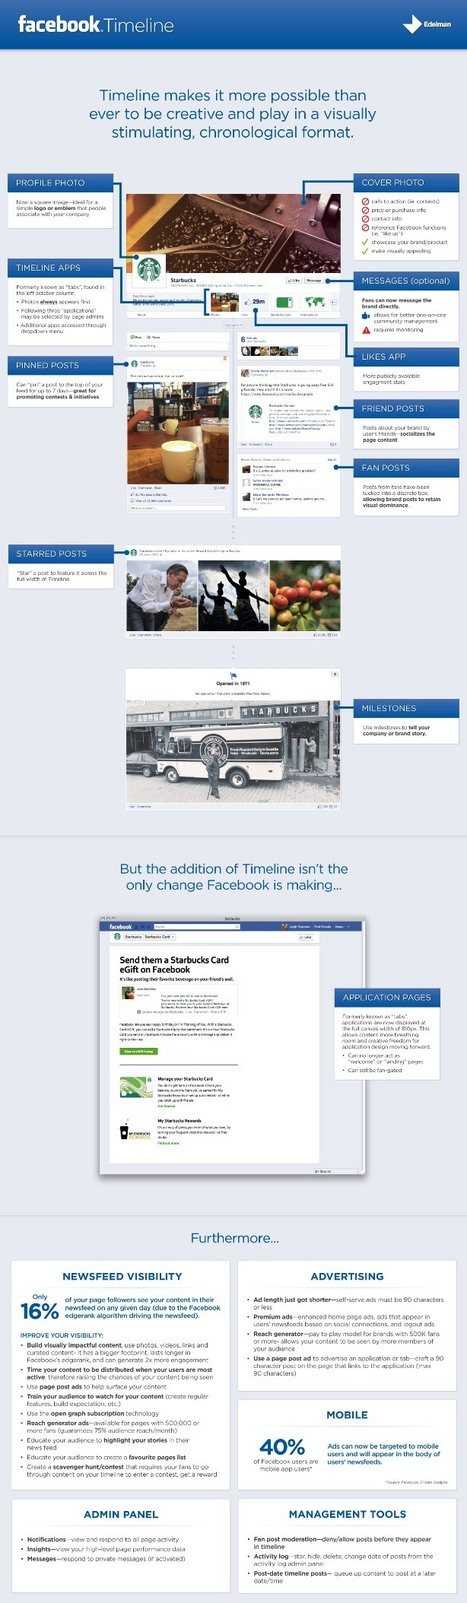 Facebook Timeline Overview Infographic | Edelman Digital | More TechBits | Scoop.it